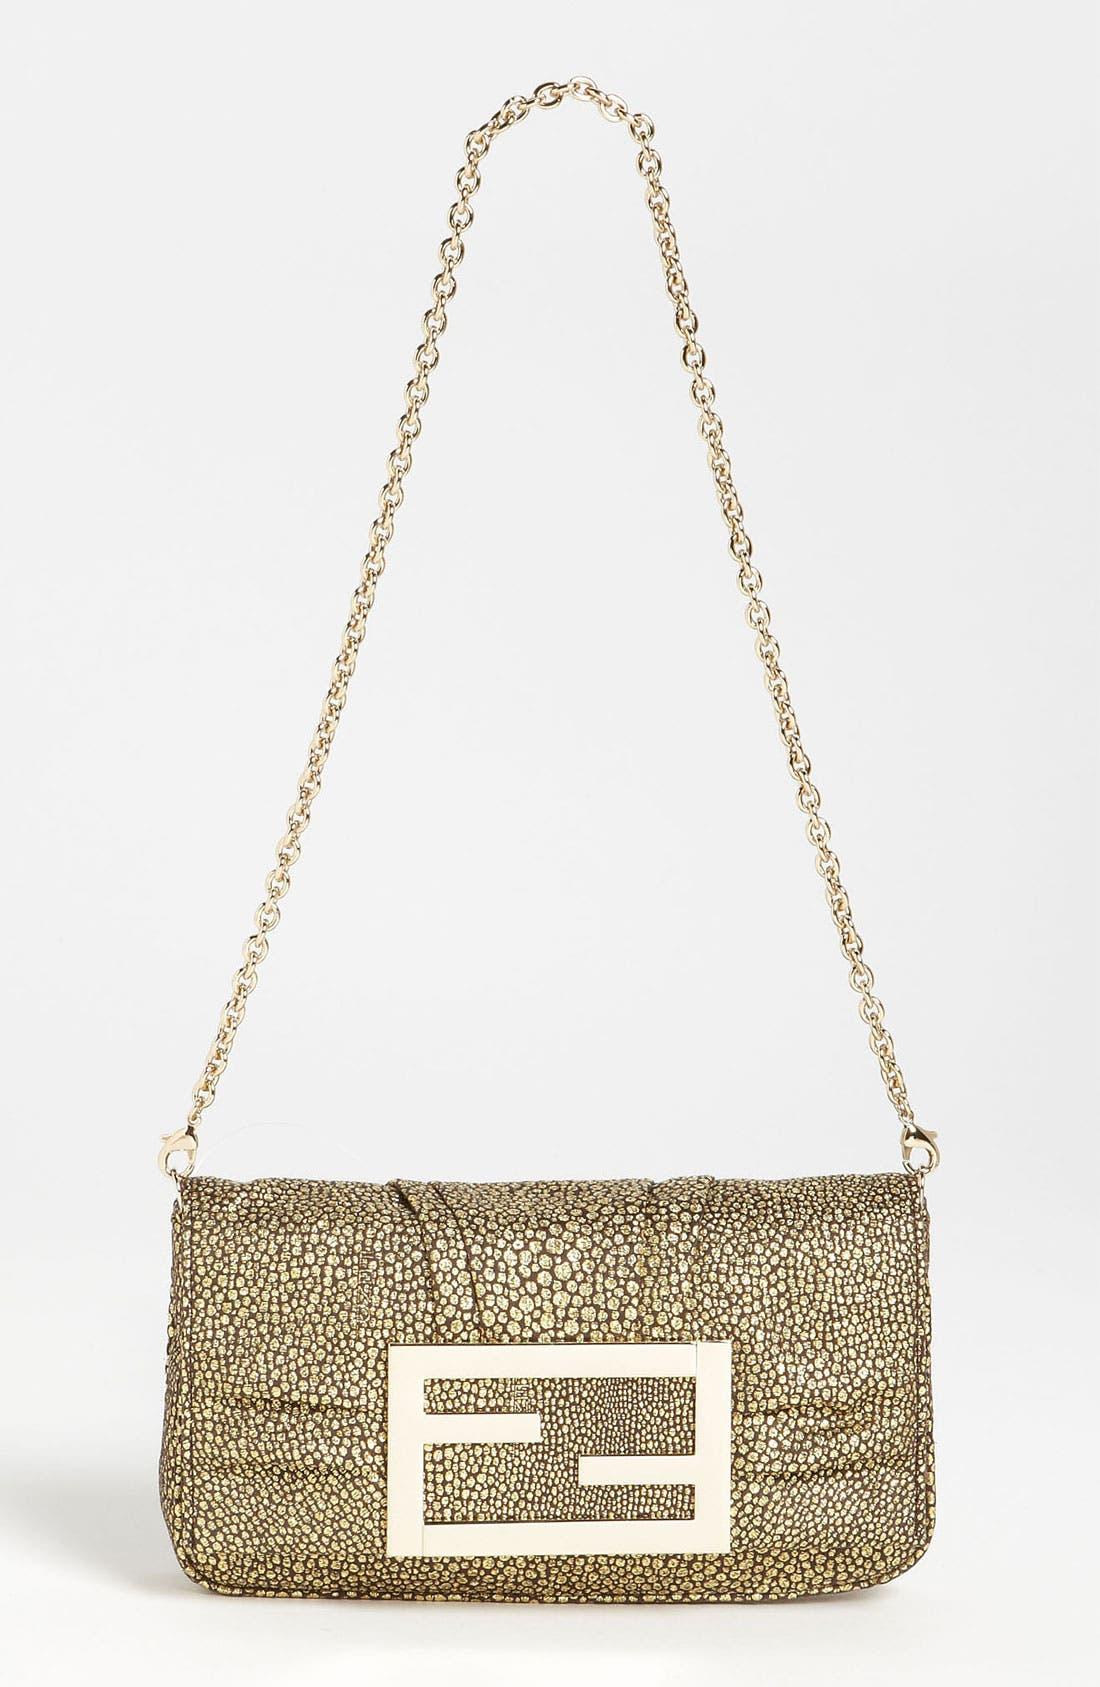 Main Image - Fendi 'Mia' Fabric Evening Bag